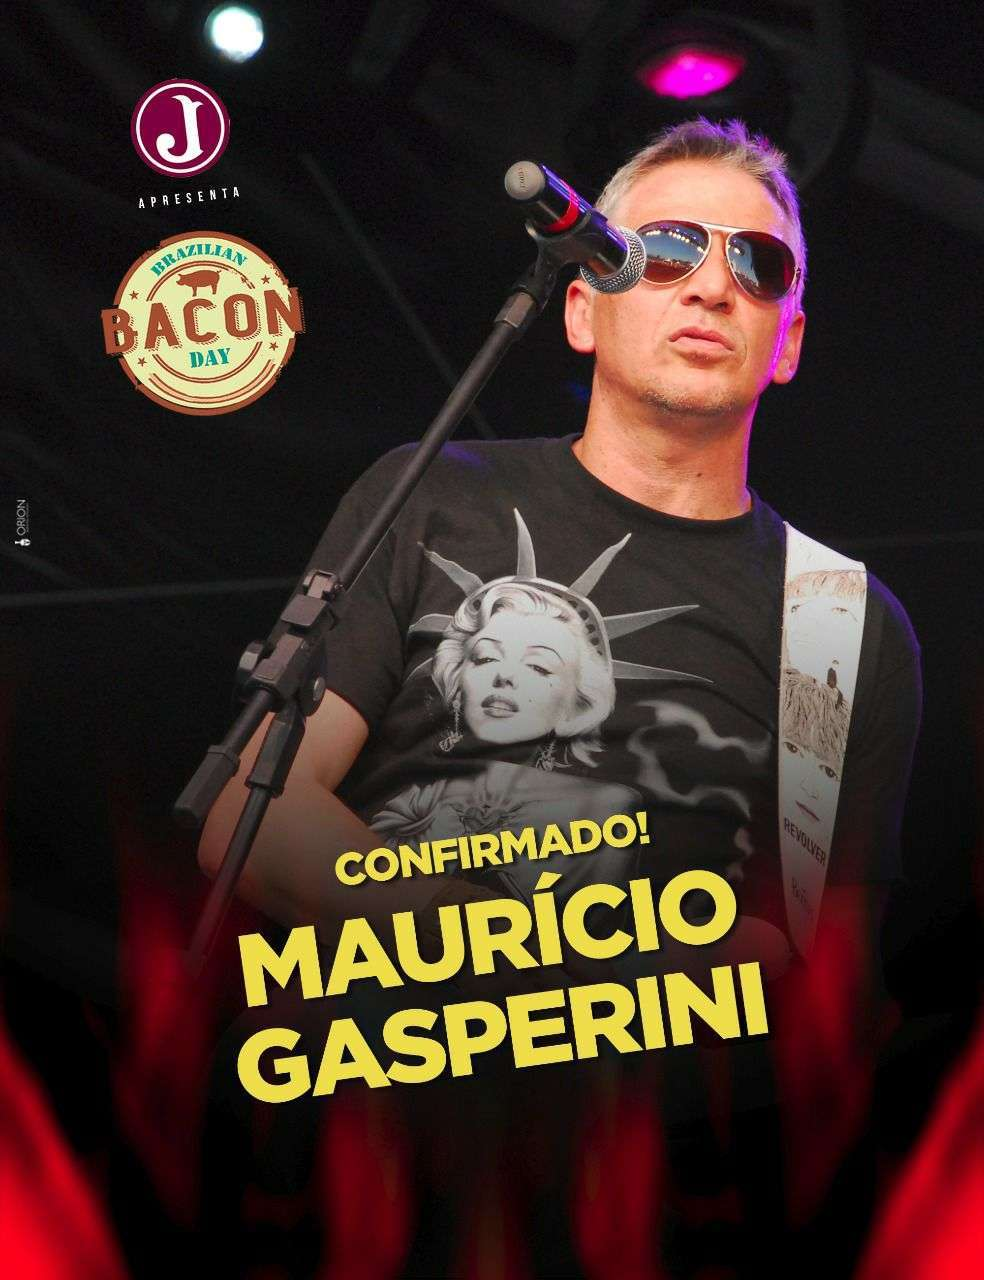 Mauricio Gasperini